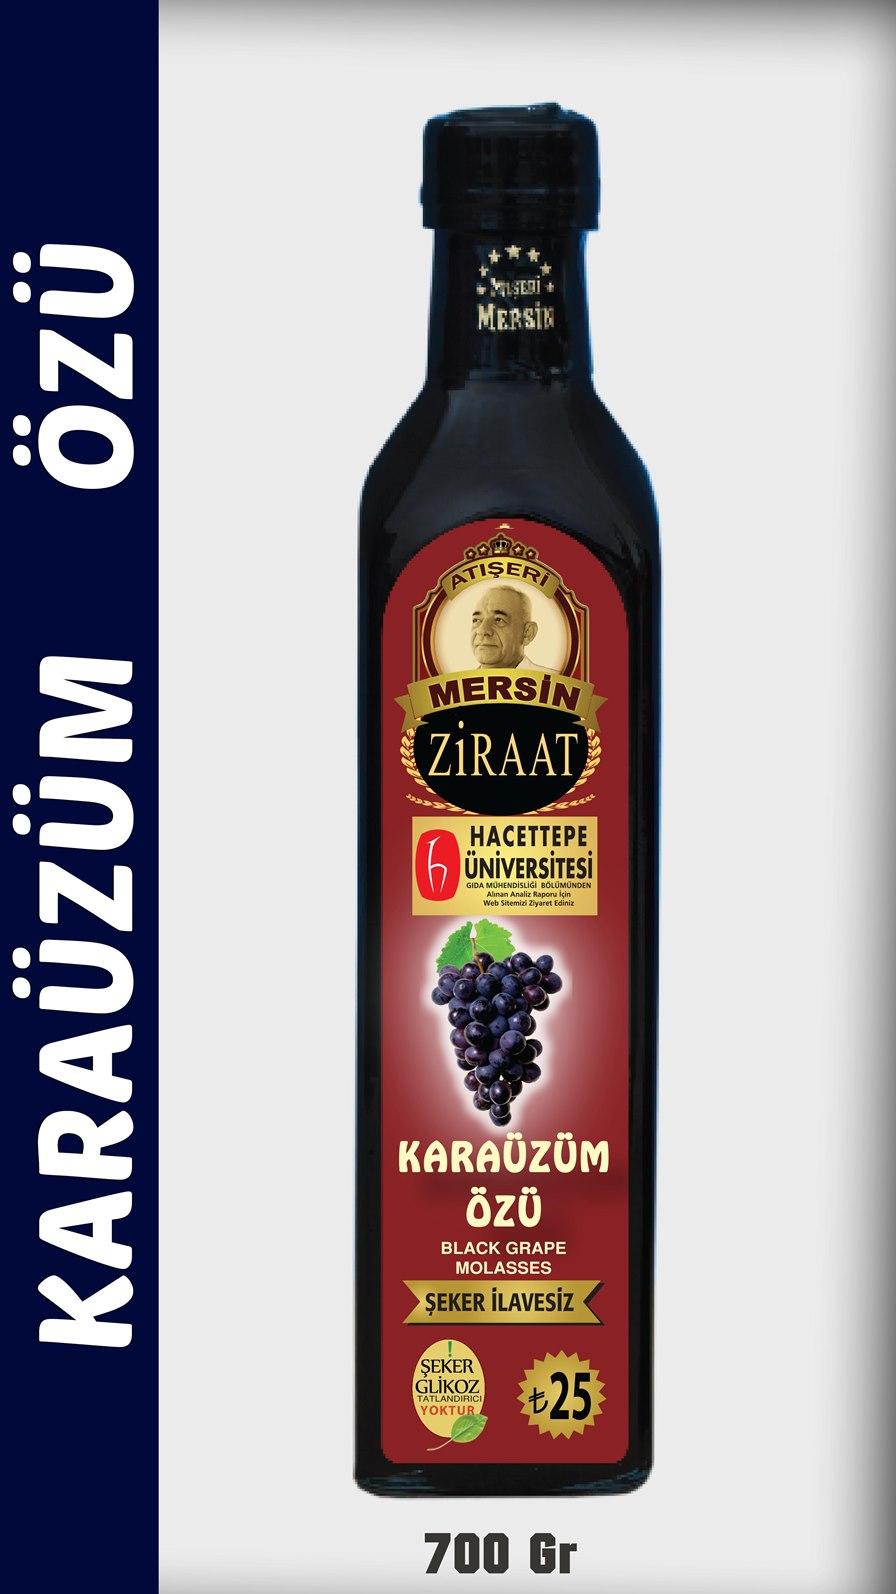 Black Grape Pulp 700 GR